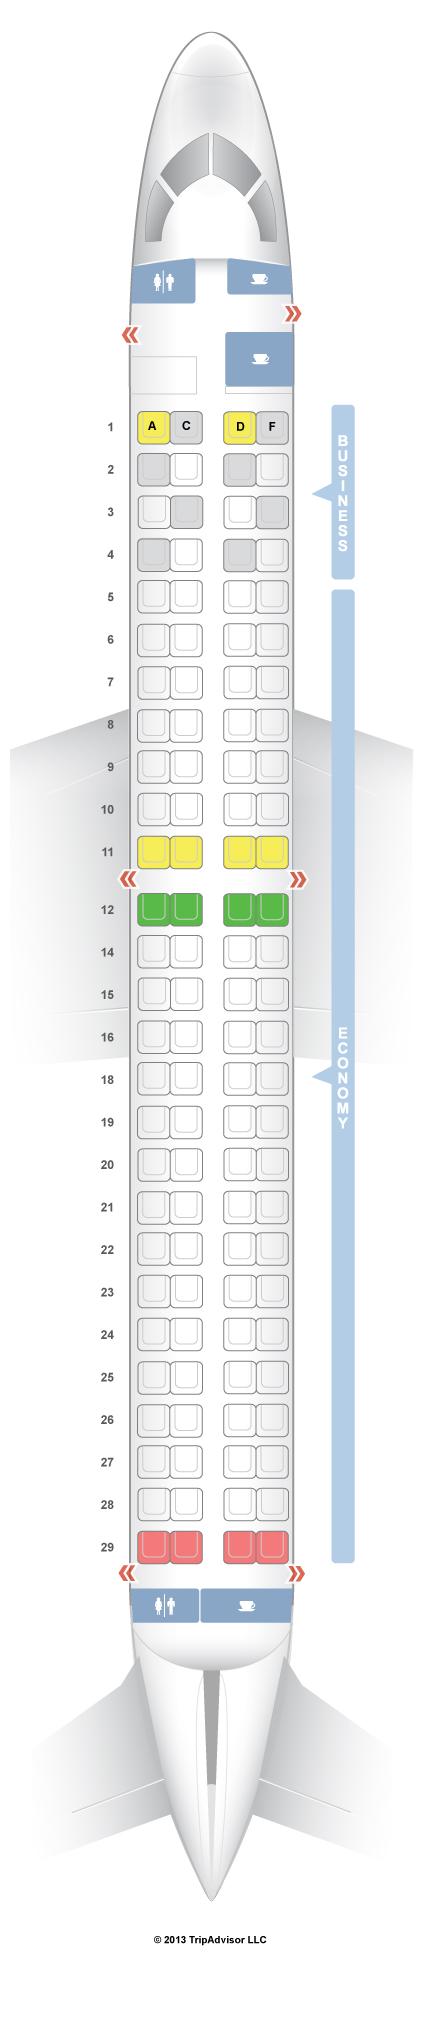 Seatguru Seat Map Lufthansa Embraer E